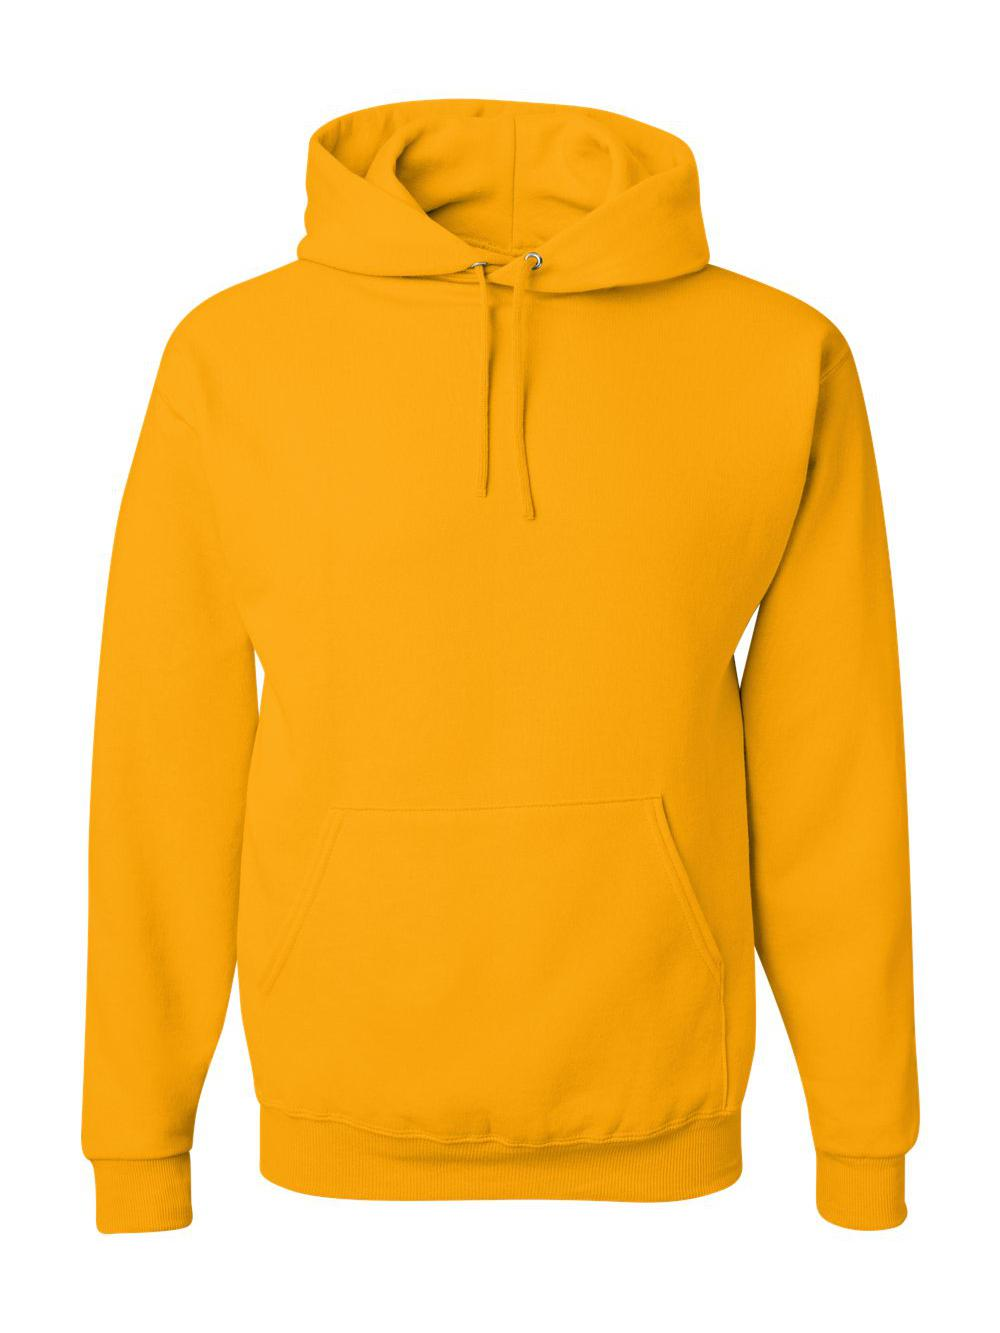 3ed05d969 JERZEES Hooded Sweatshirt Men's 8 Oz NuBlend 50/50 Pullover 996 3xl ...